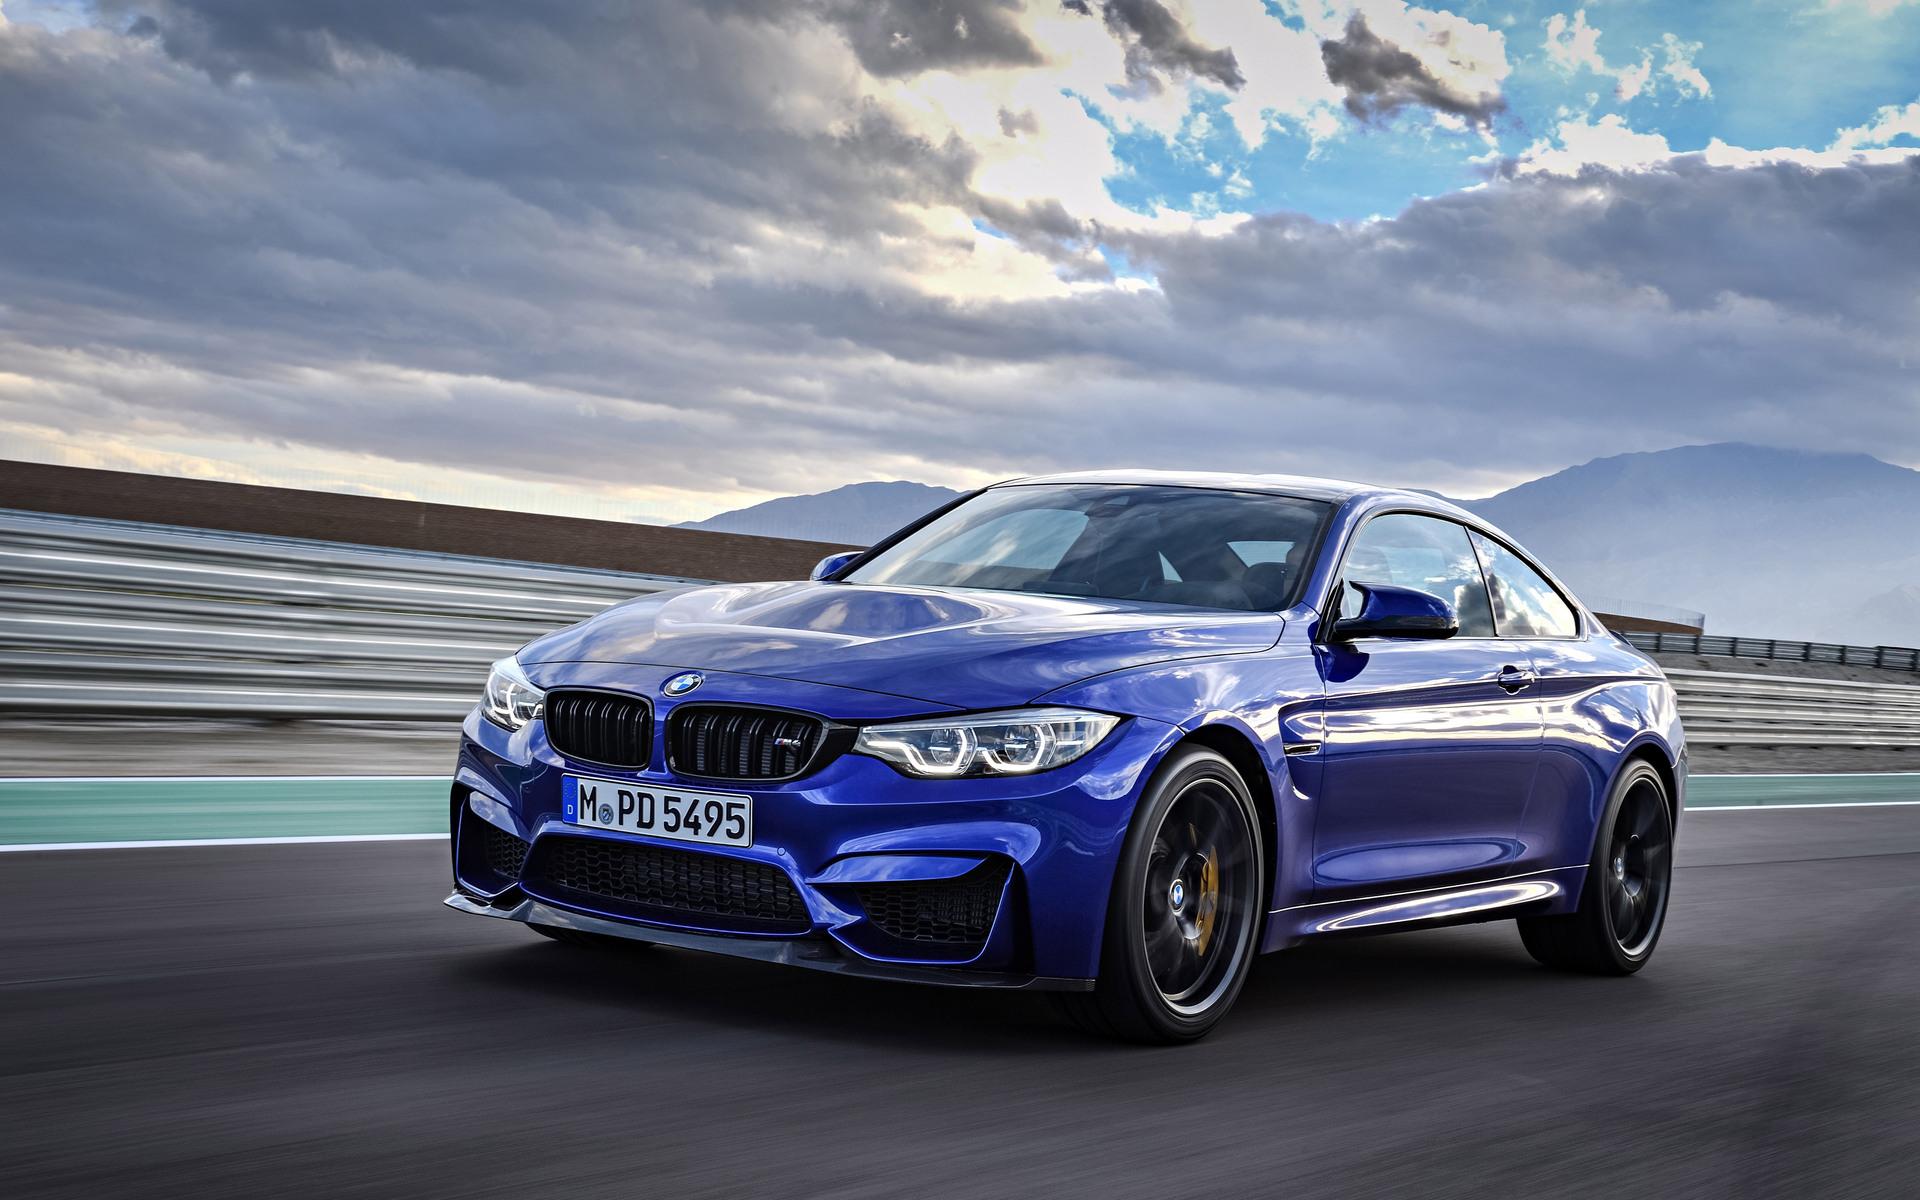 1920x1200 BMW M4 CS 2018 1080P Resolution HD 4k Wallpapers ...